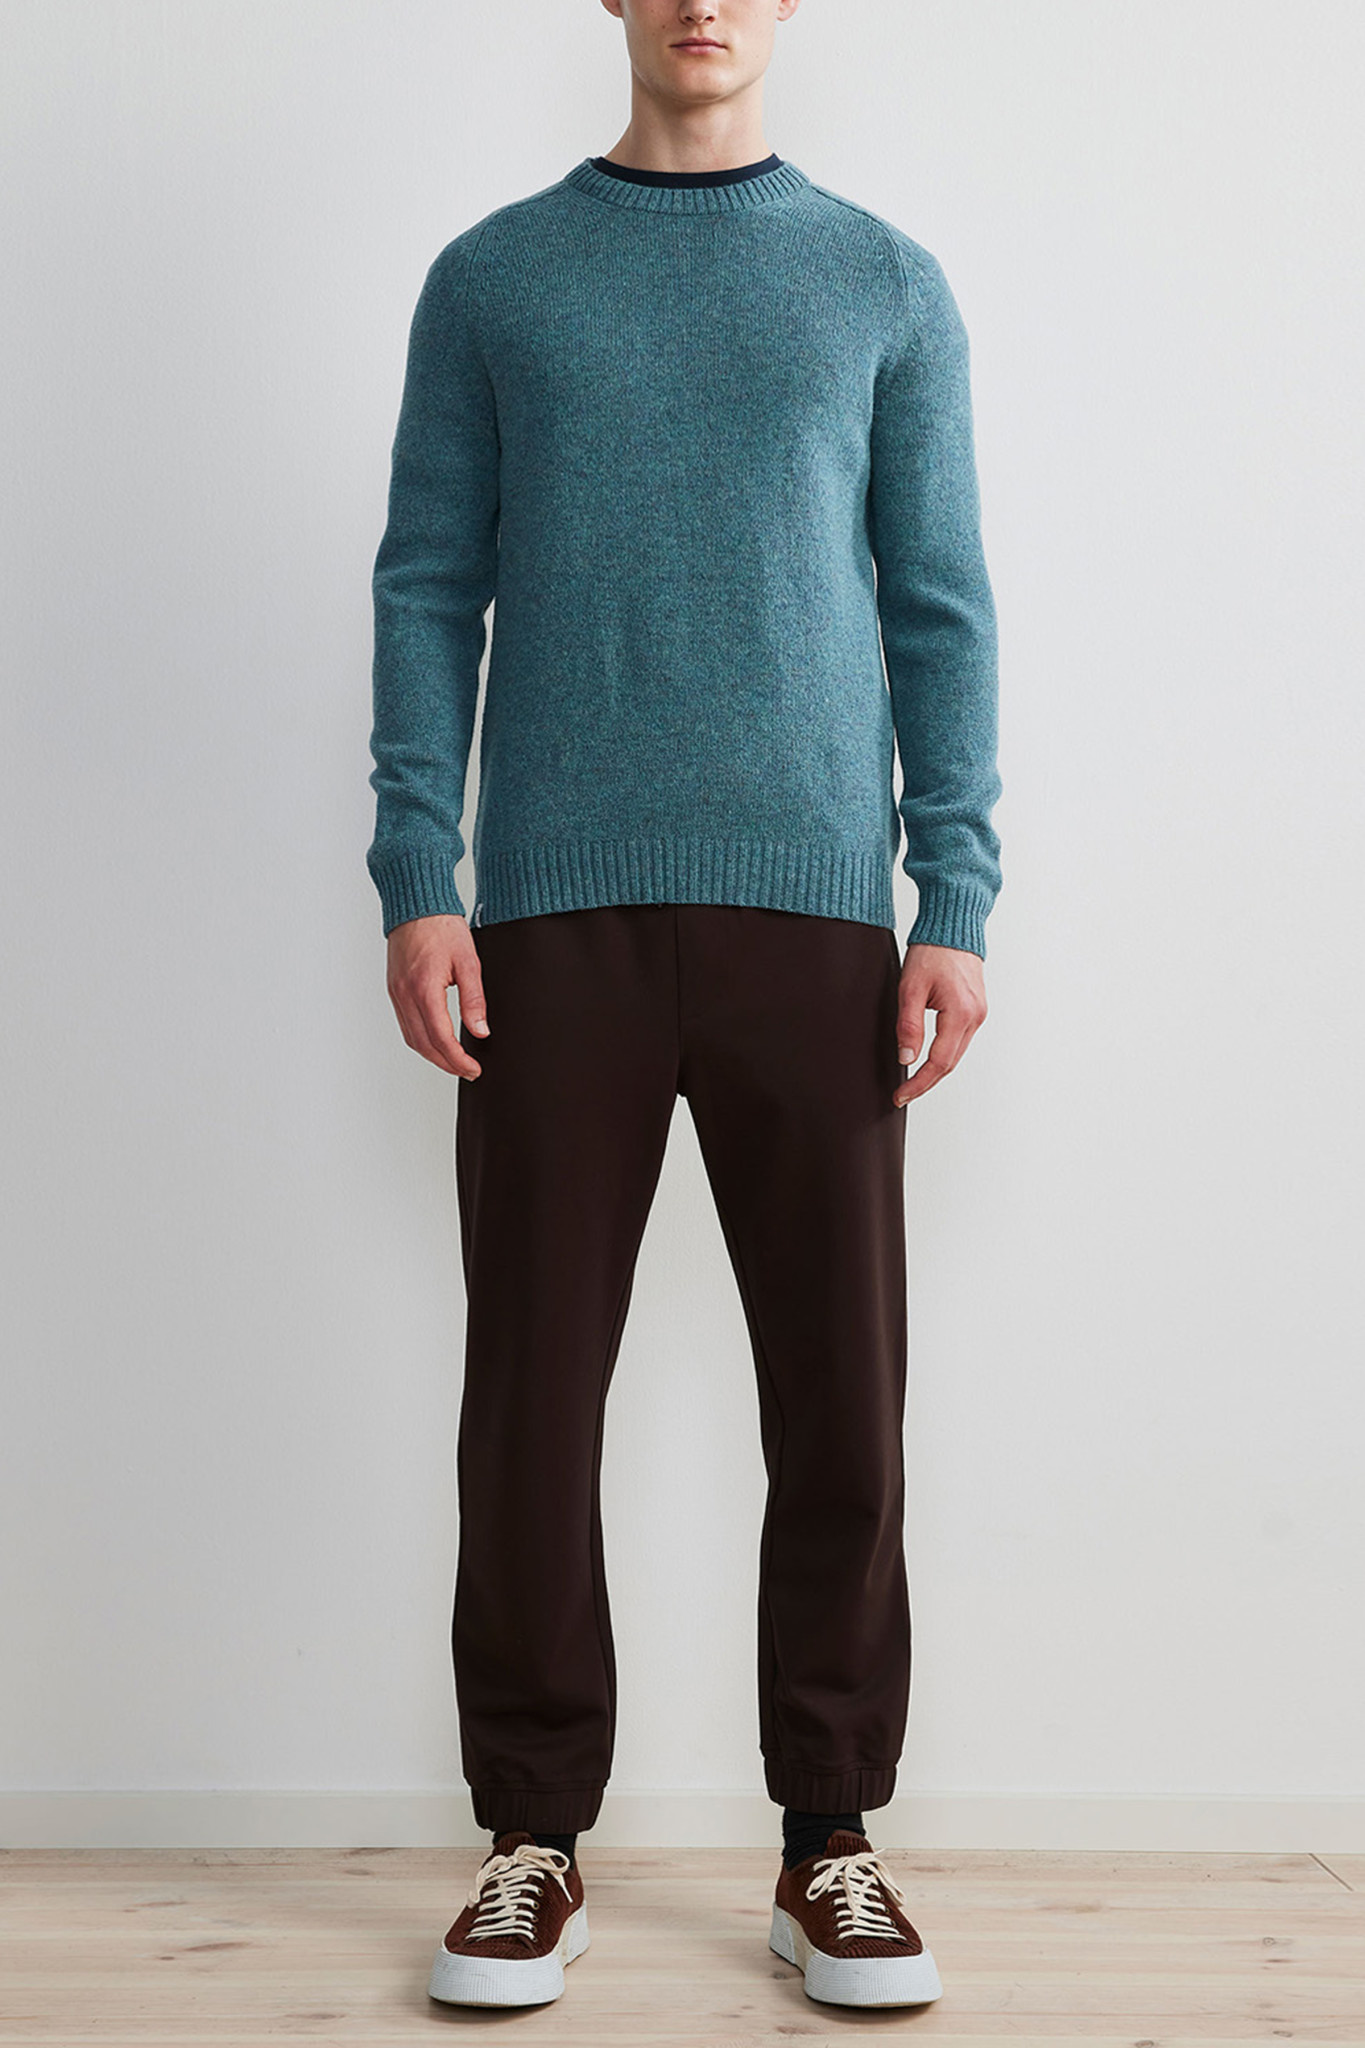 Nathan Knitwear - Ocean Blue-2